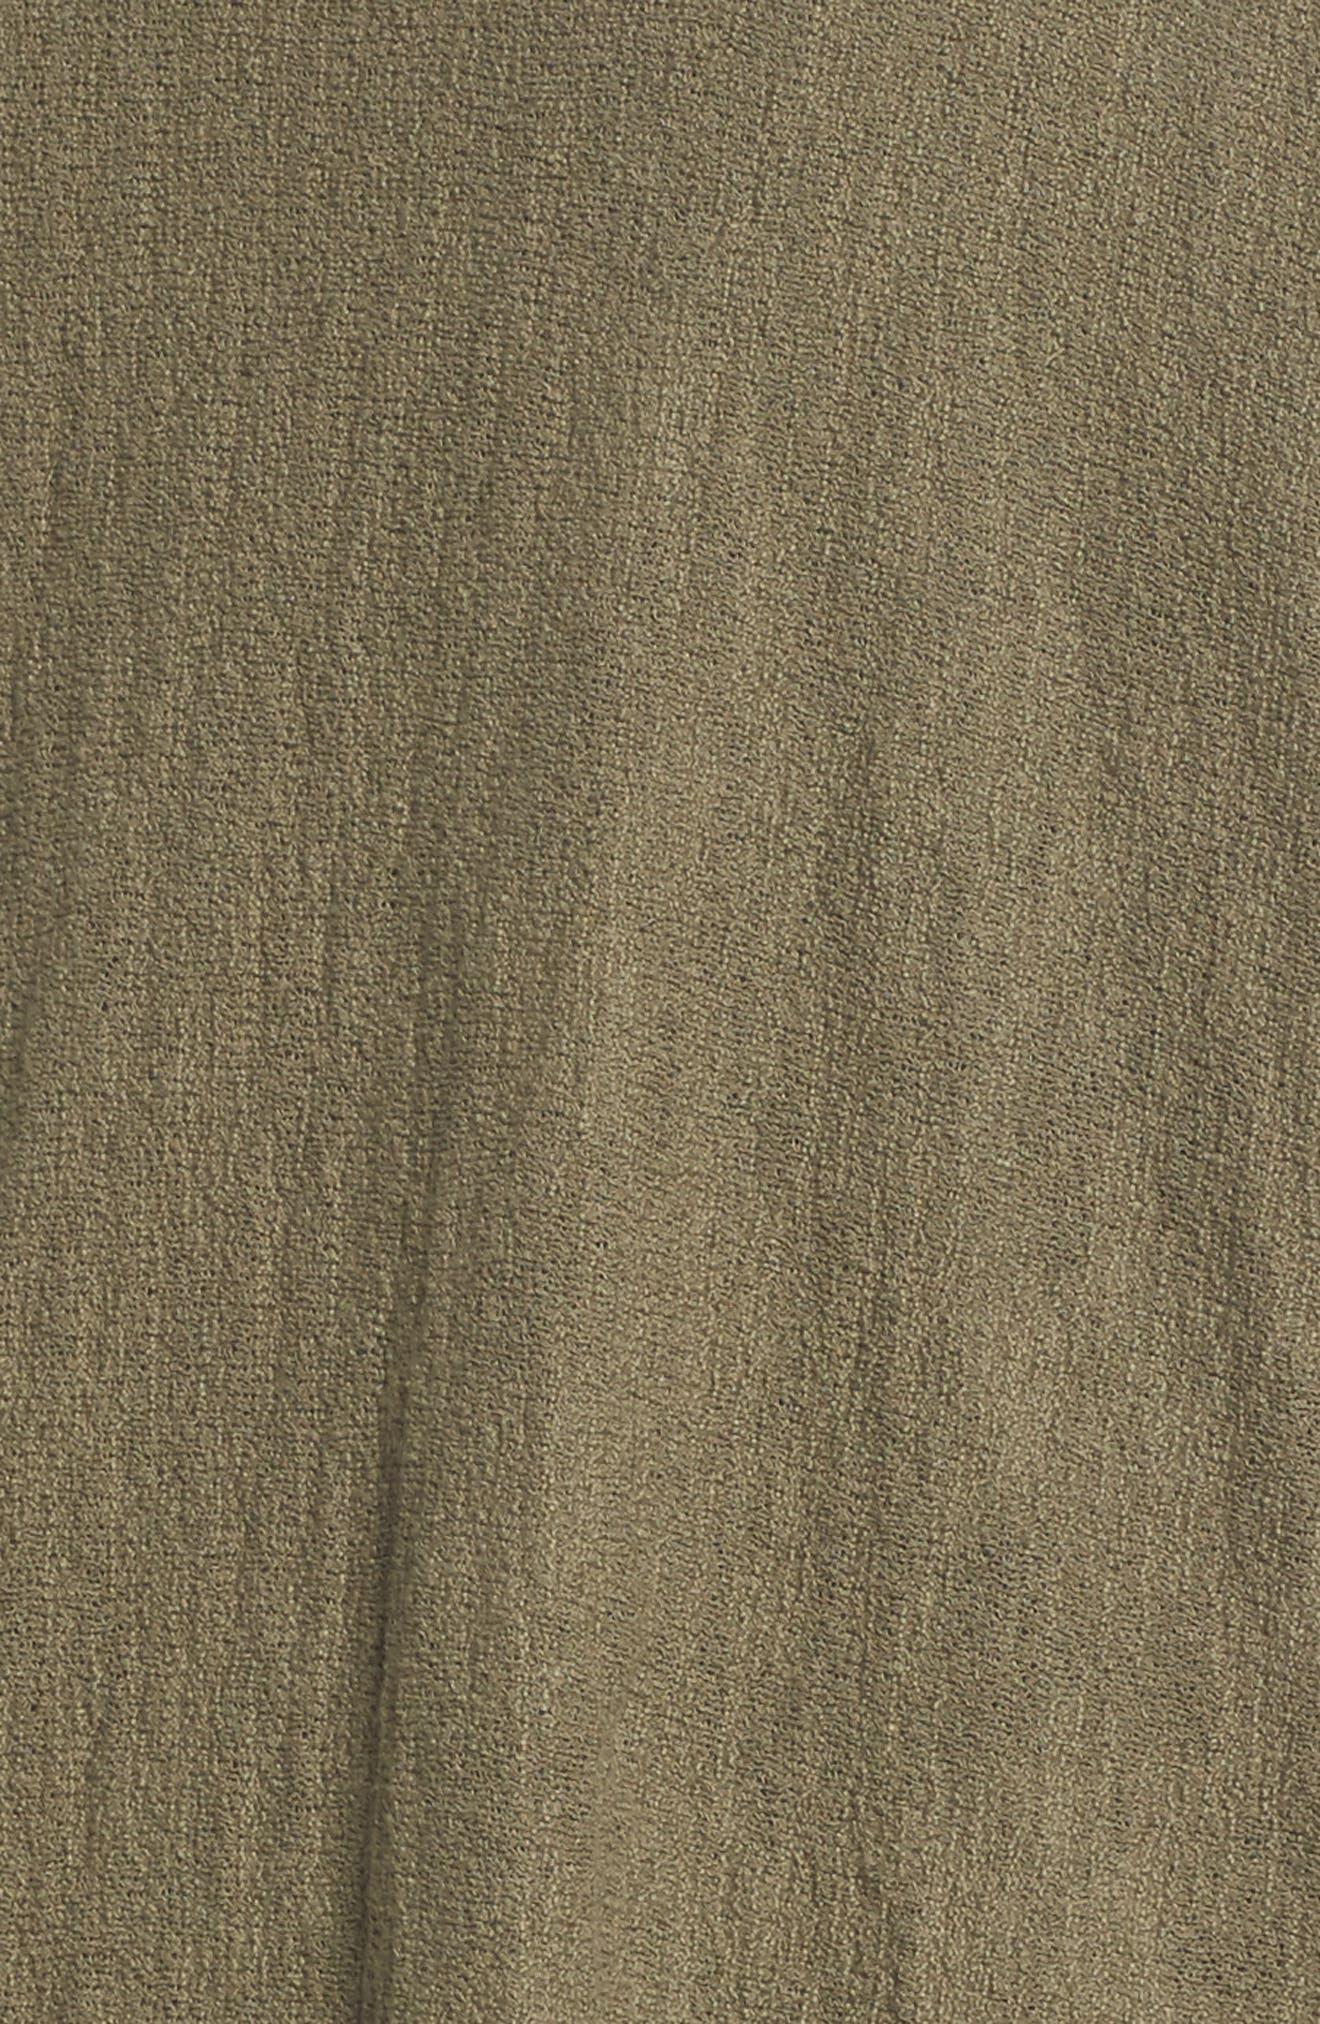 Drop Shoulder Cardigan,                             Alternate thumbnail 6, color,                             Olive Kalamata